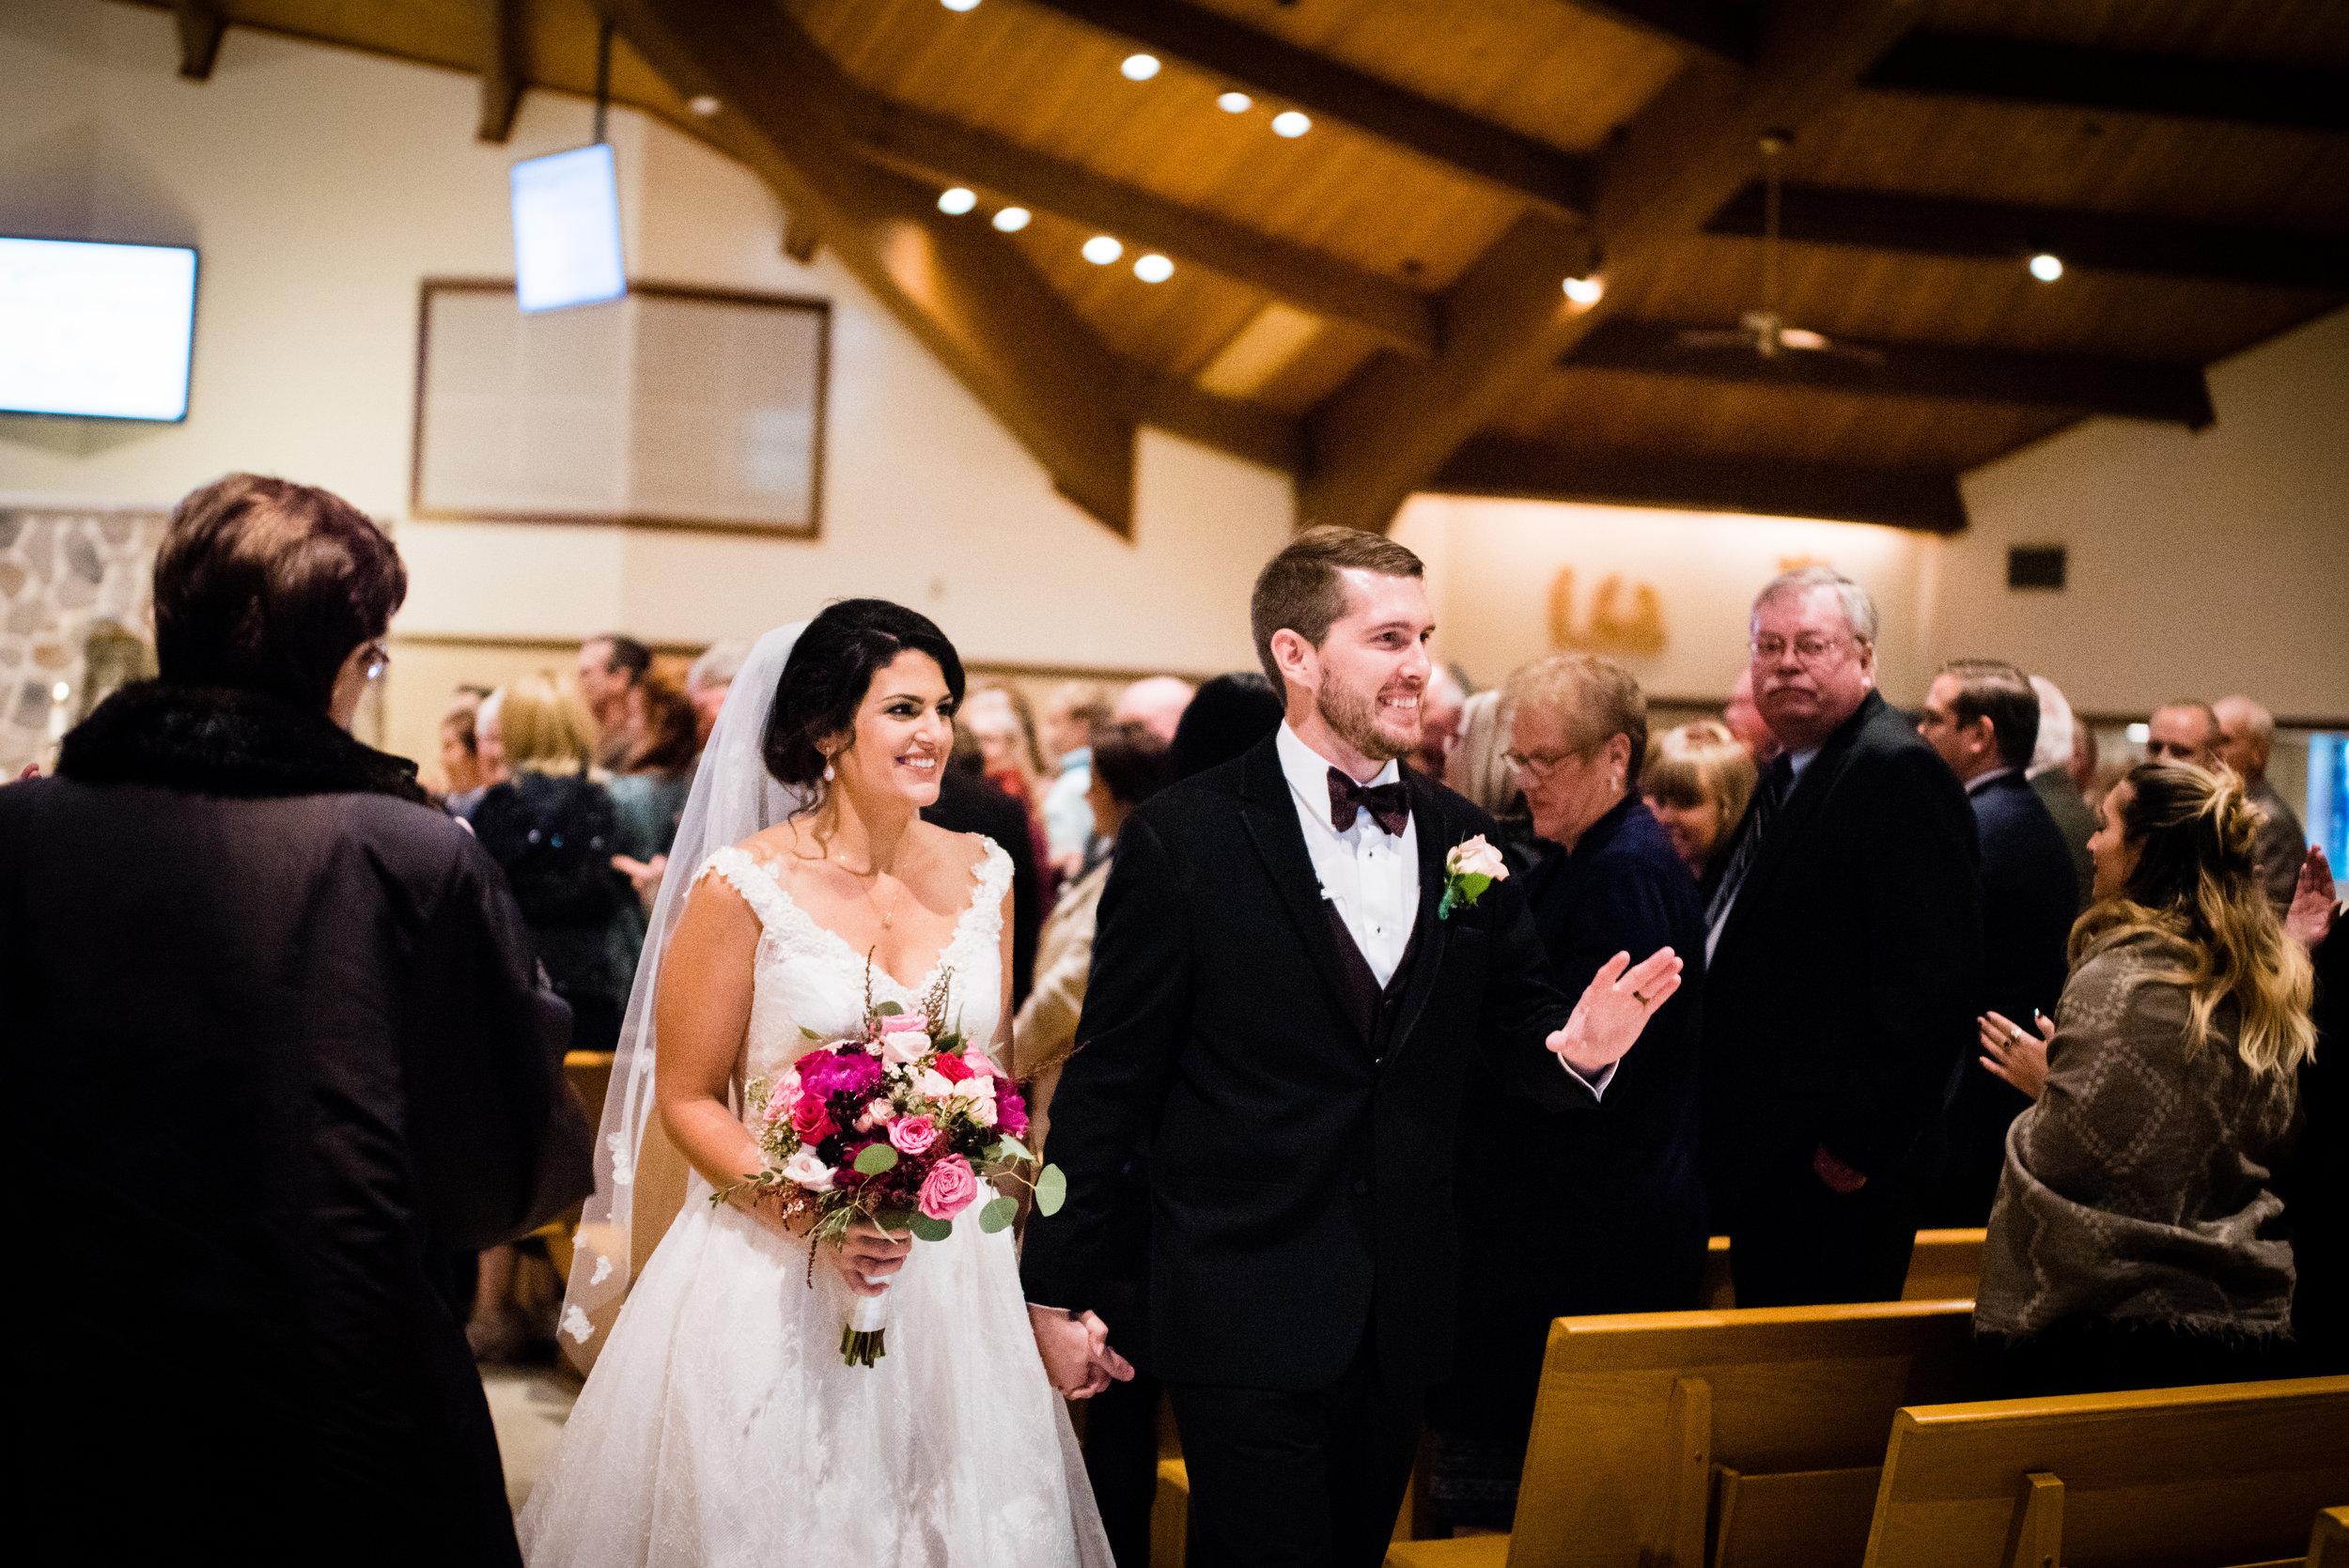 Luciens Manor Wedding Photos - 039.jpg